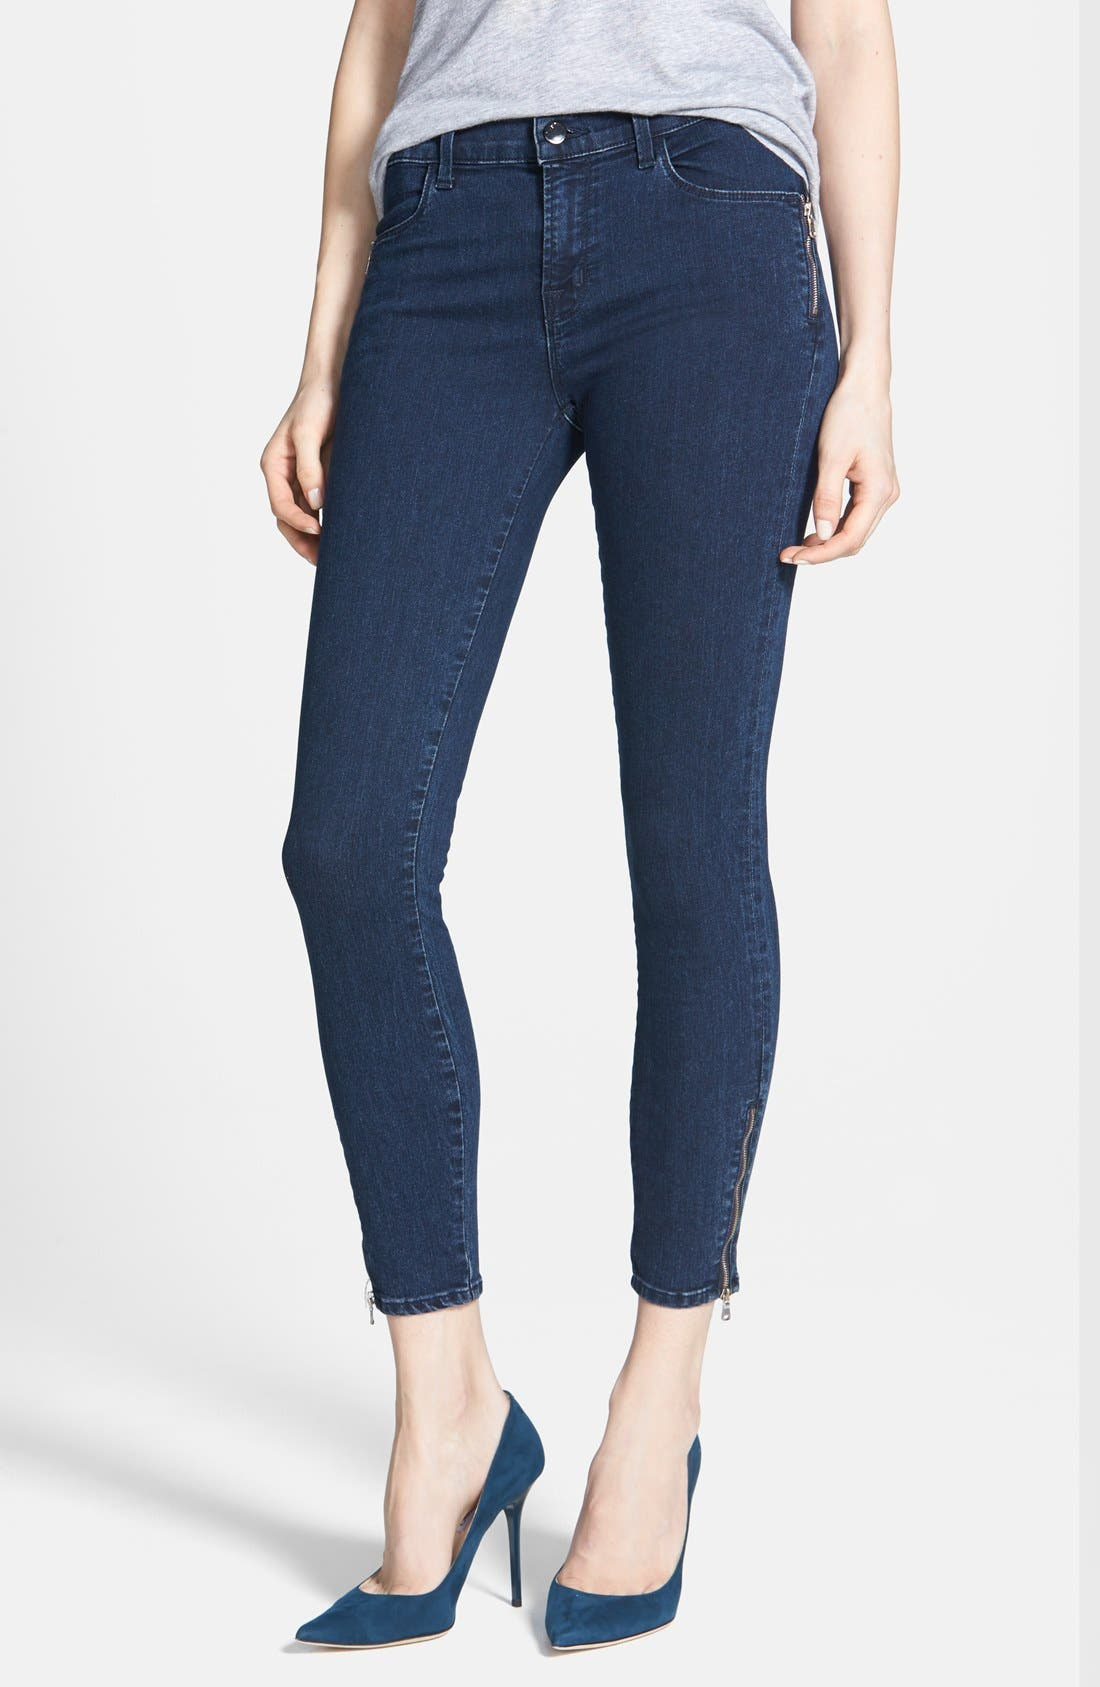 Alternate Image 1 Selected - J Brand 'Tali' Zip Detail Skinny Crop Jeans (Blue Depth)